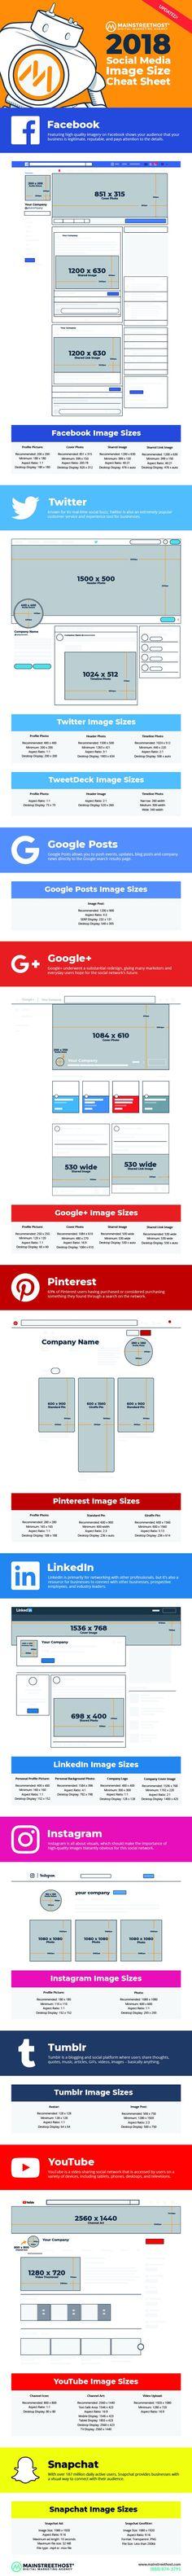 Social Media Optimisation: The 2018 Social Media Image Size Cheat Sheet [Infographic]